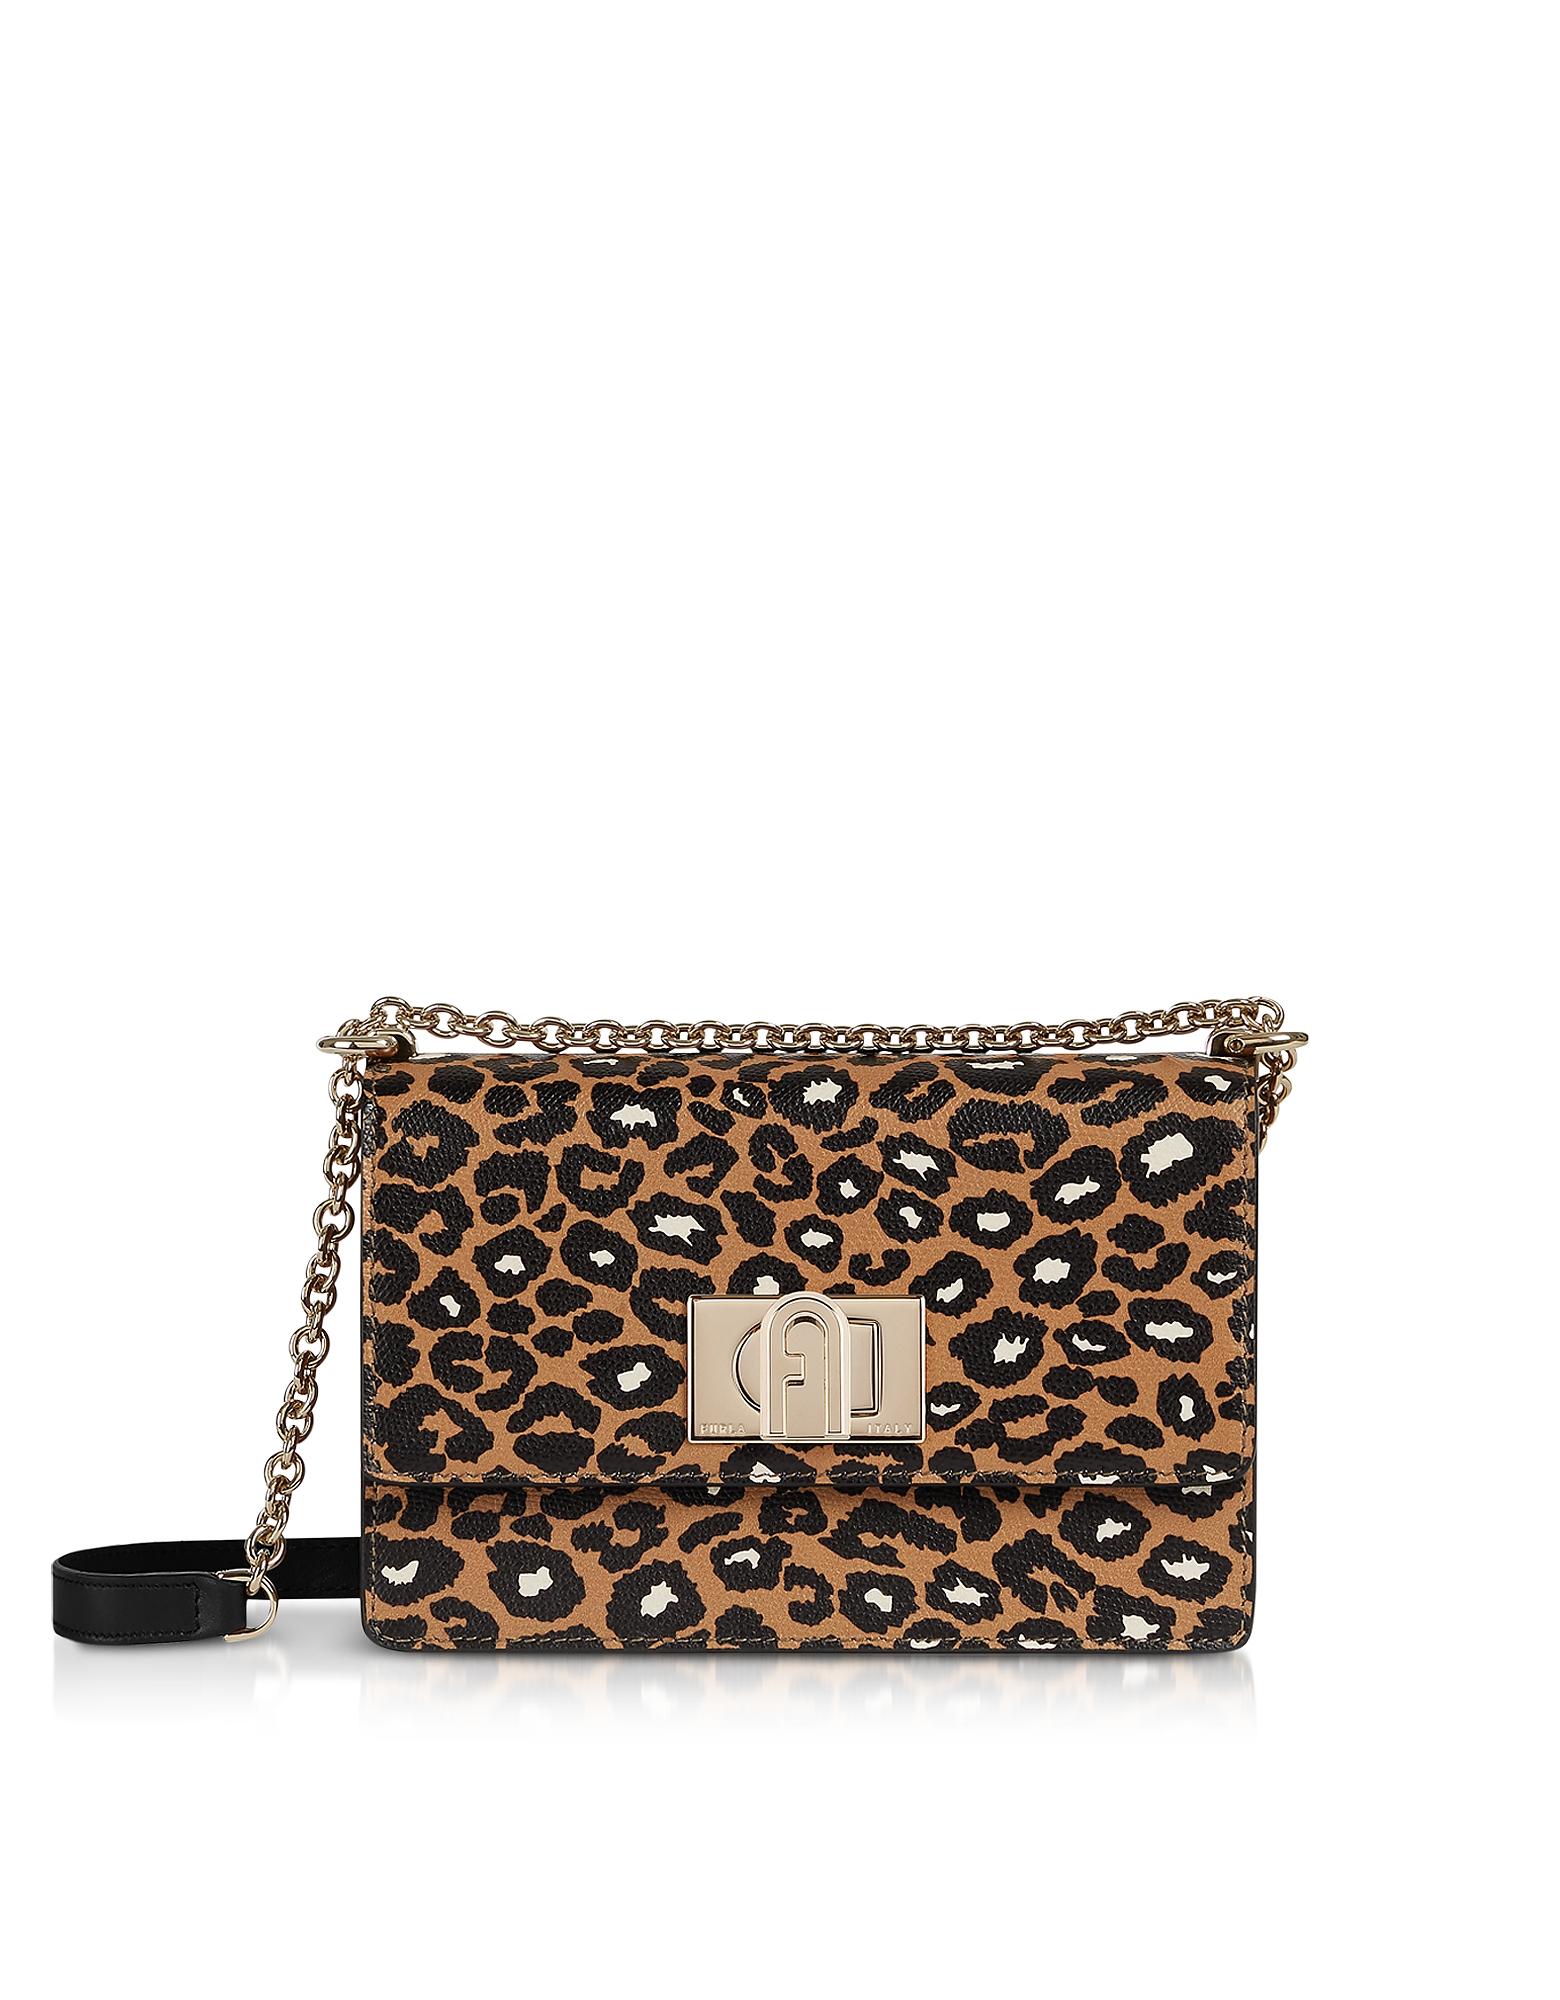 Furla Designer Handbags, Animal Printed Leather 1927 Mini Crossbody Bag 20